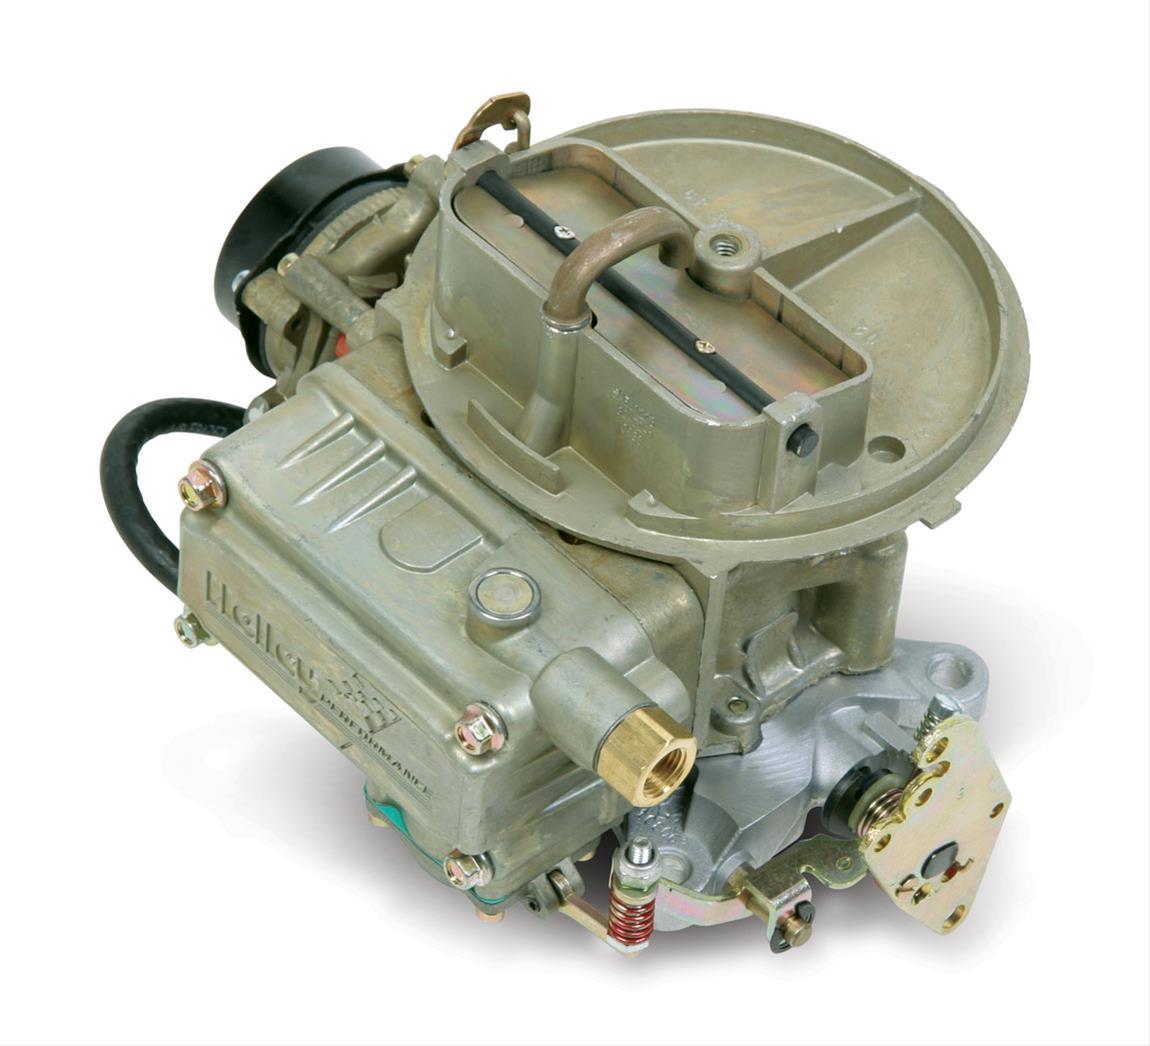 Holley 2300 Marine Carburetors 0-80402-1